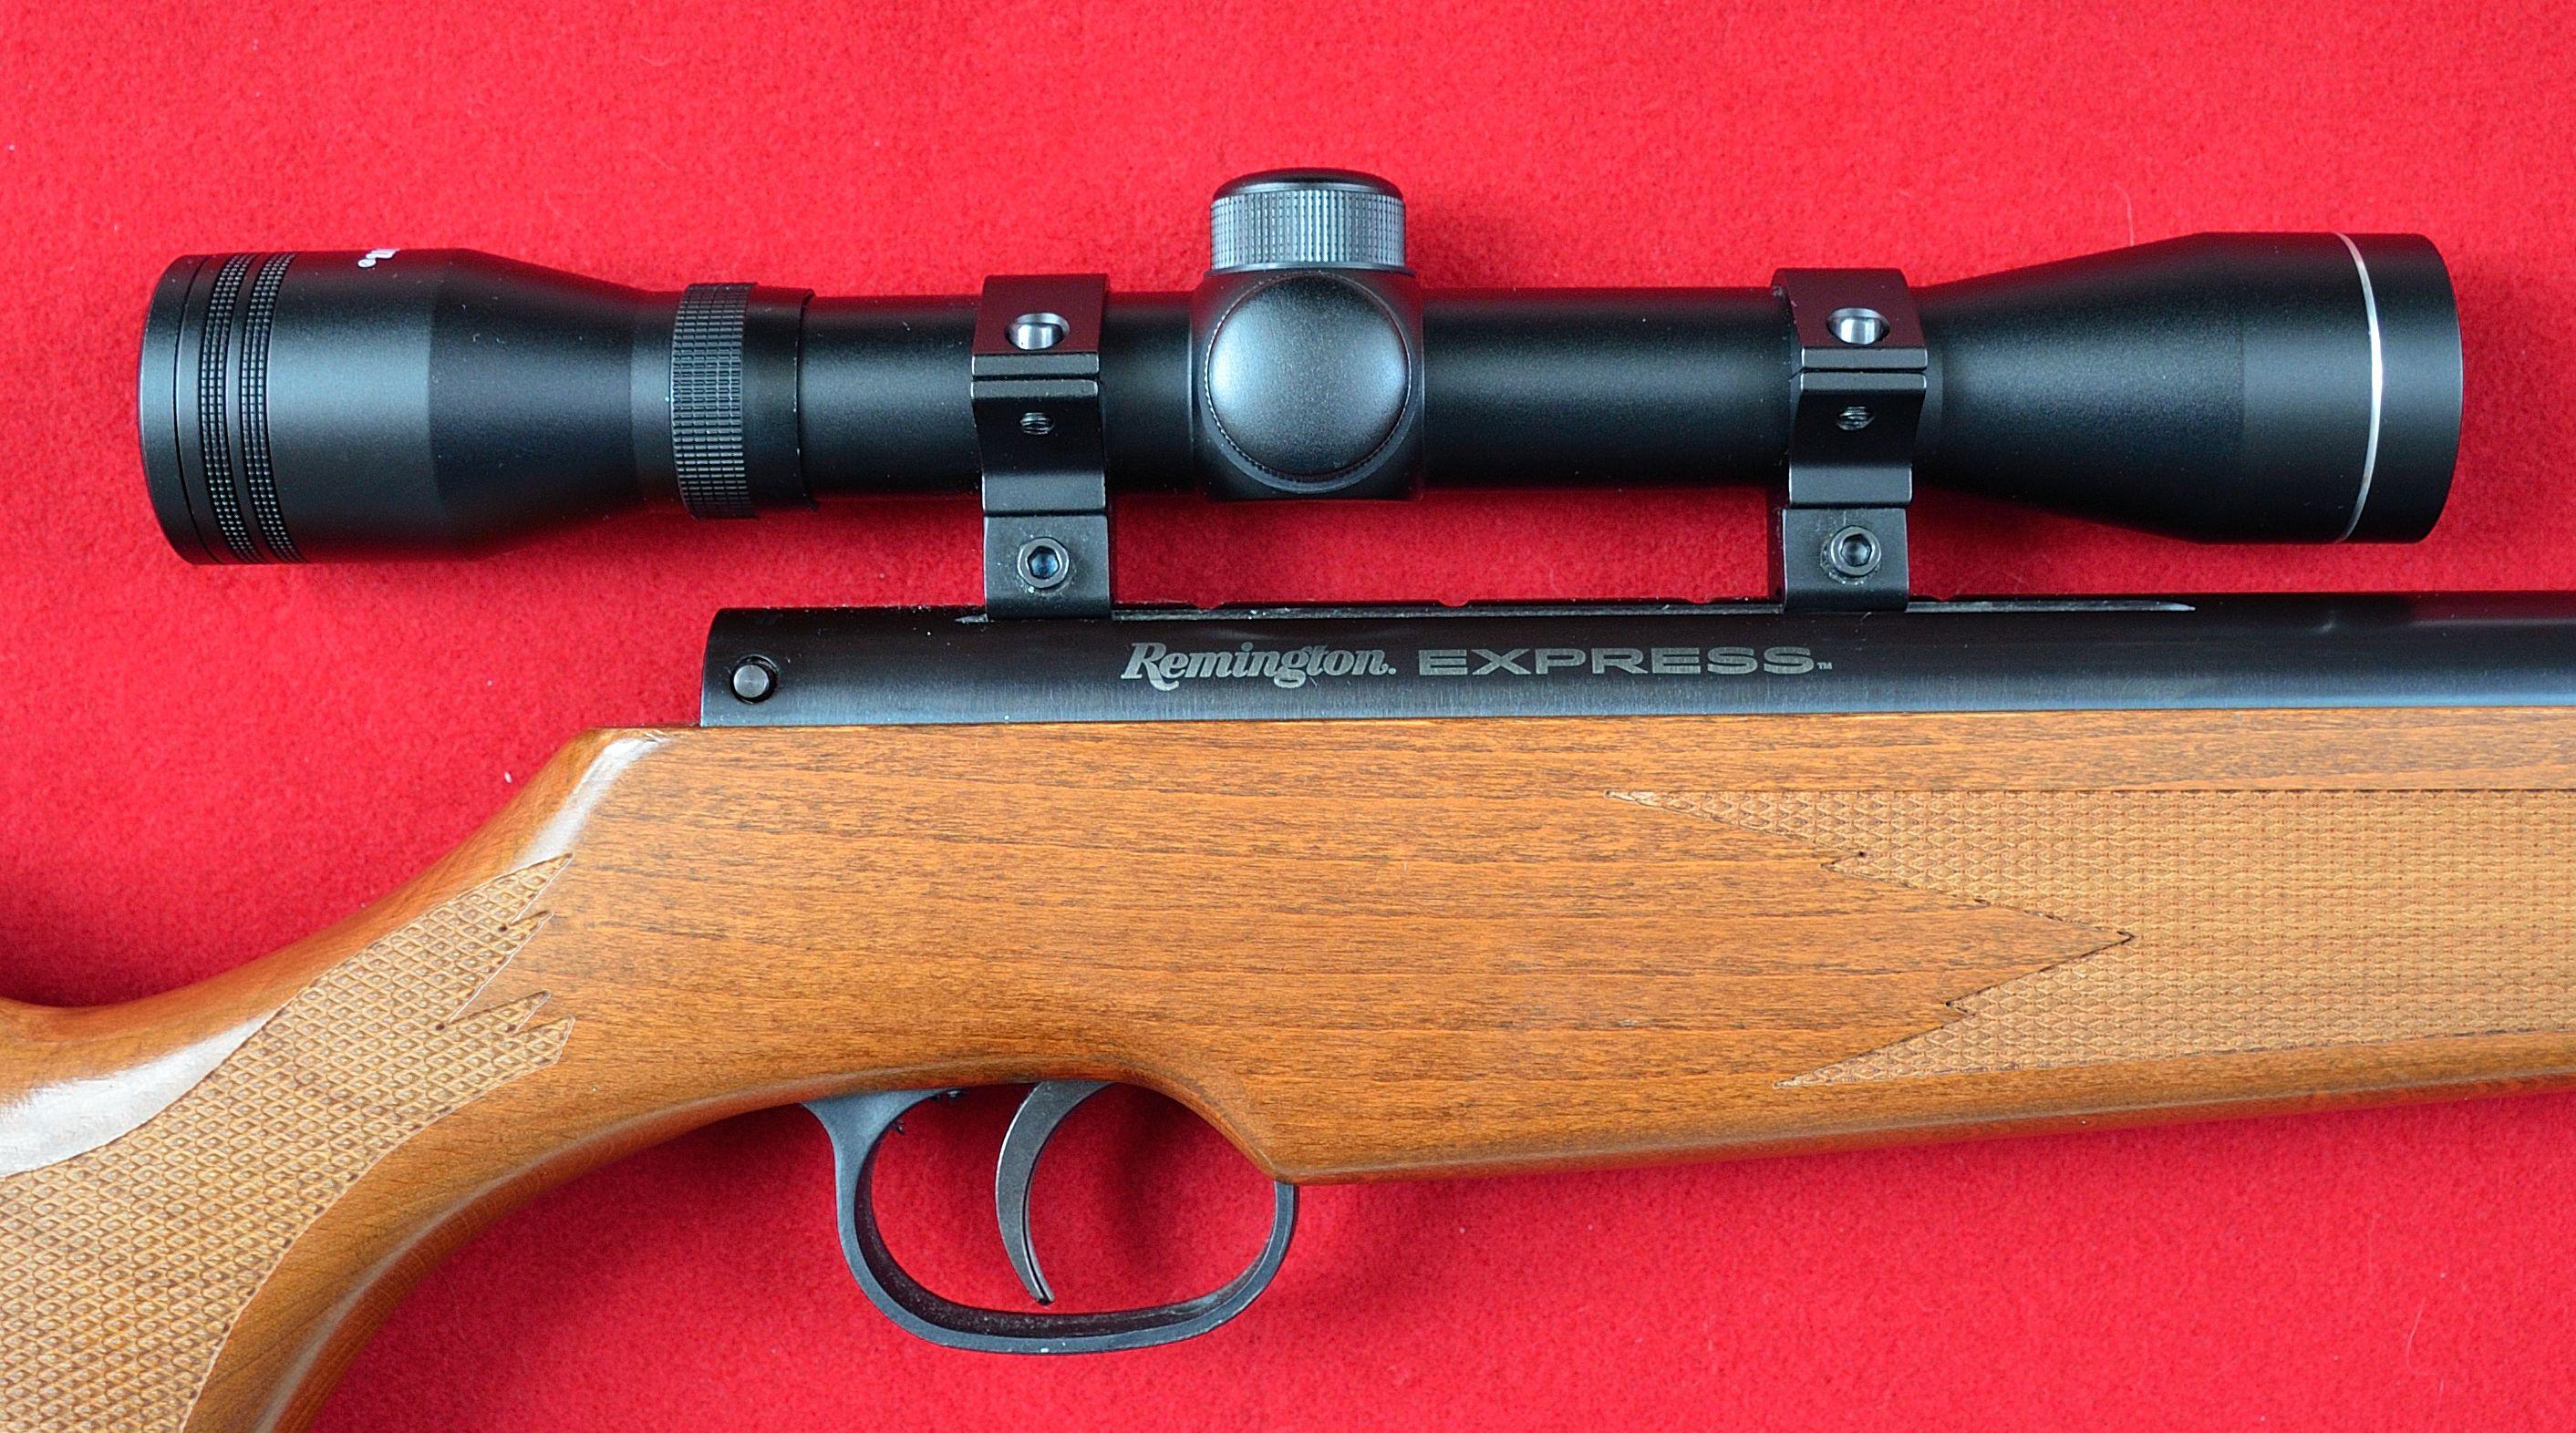 Dating my remington rifle